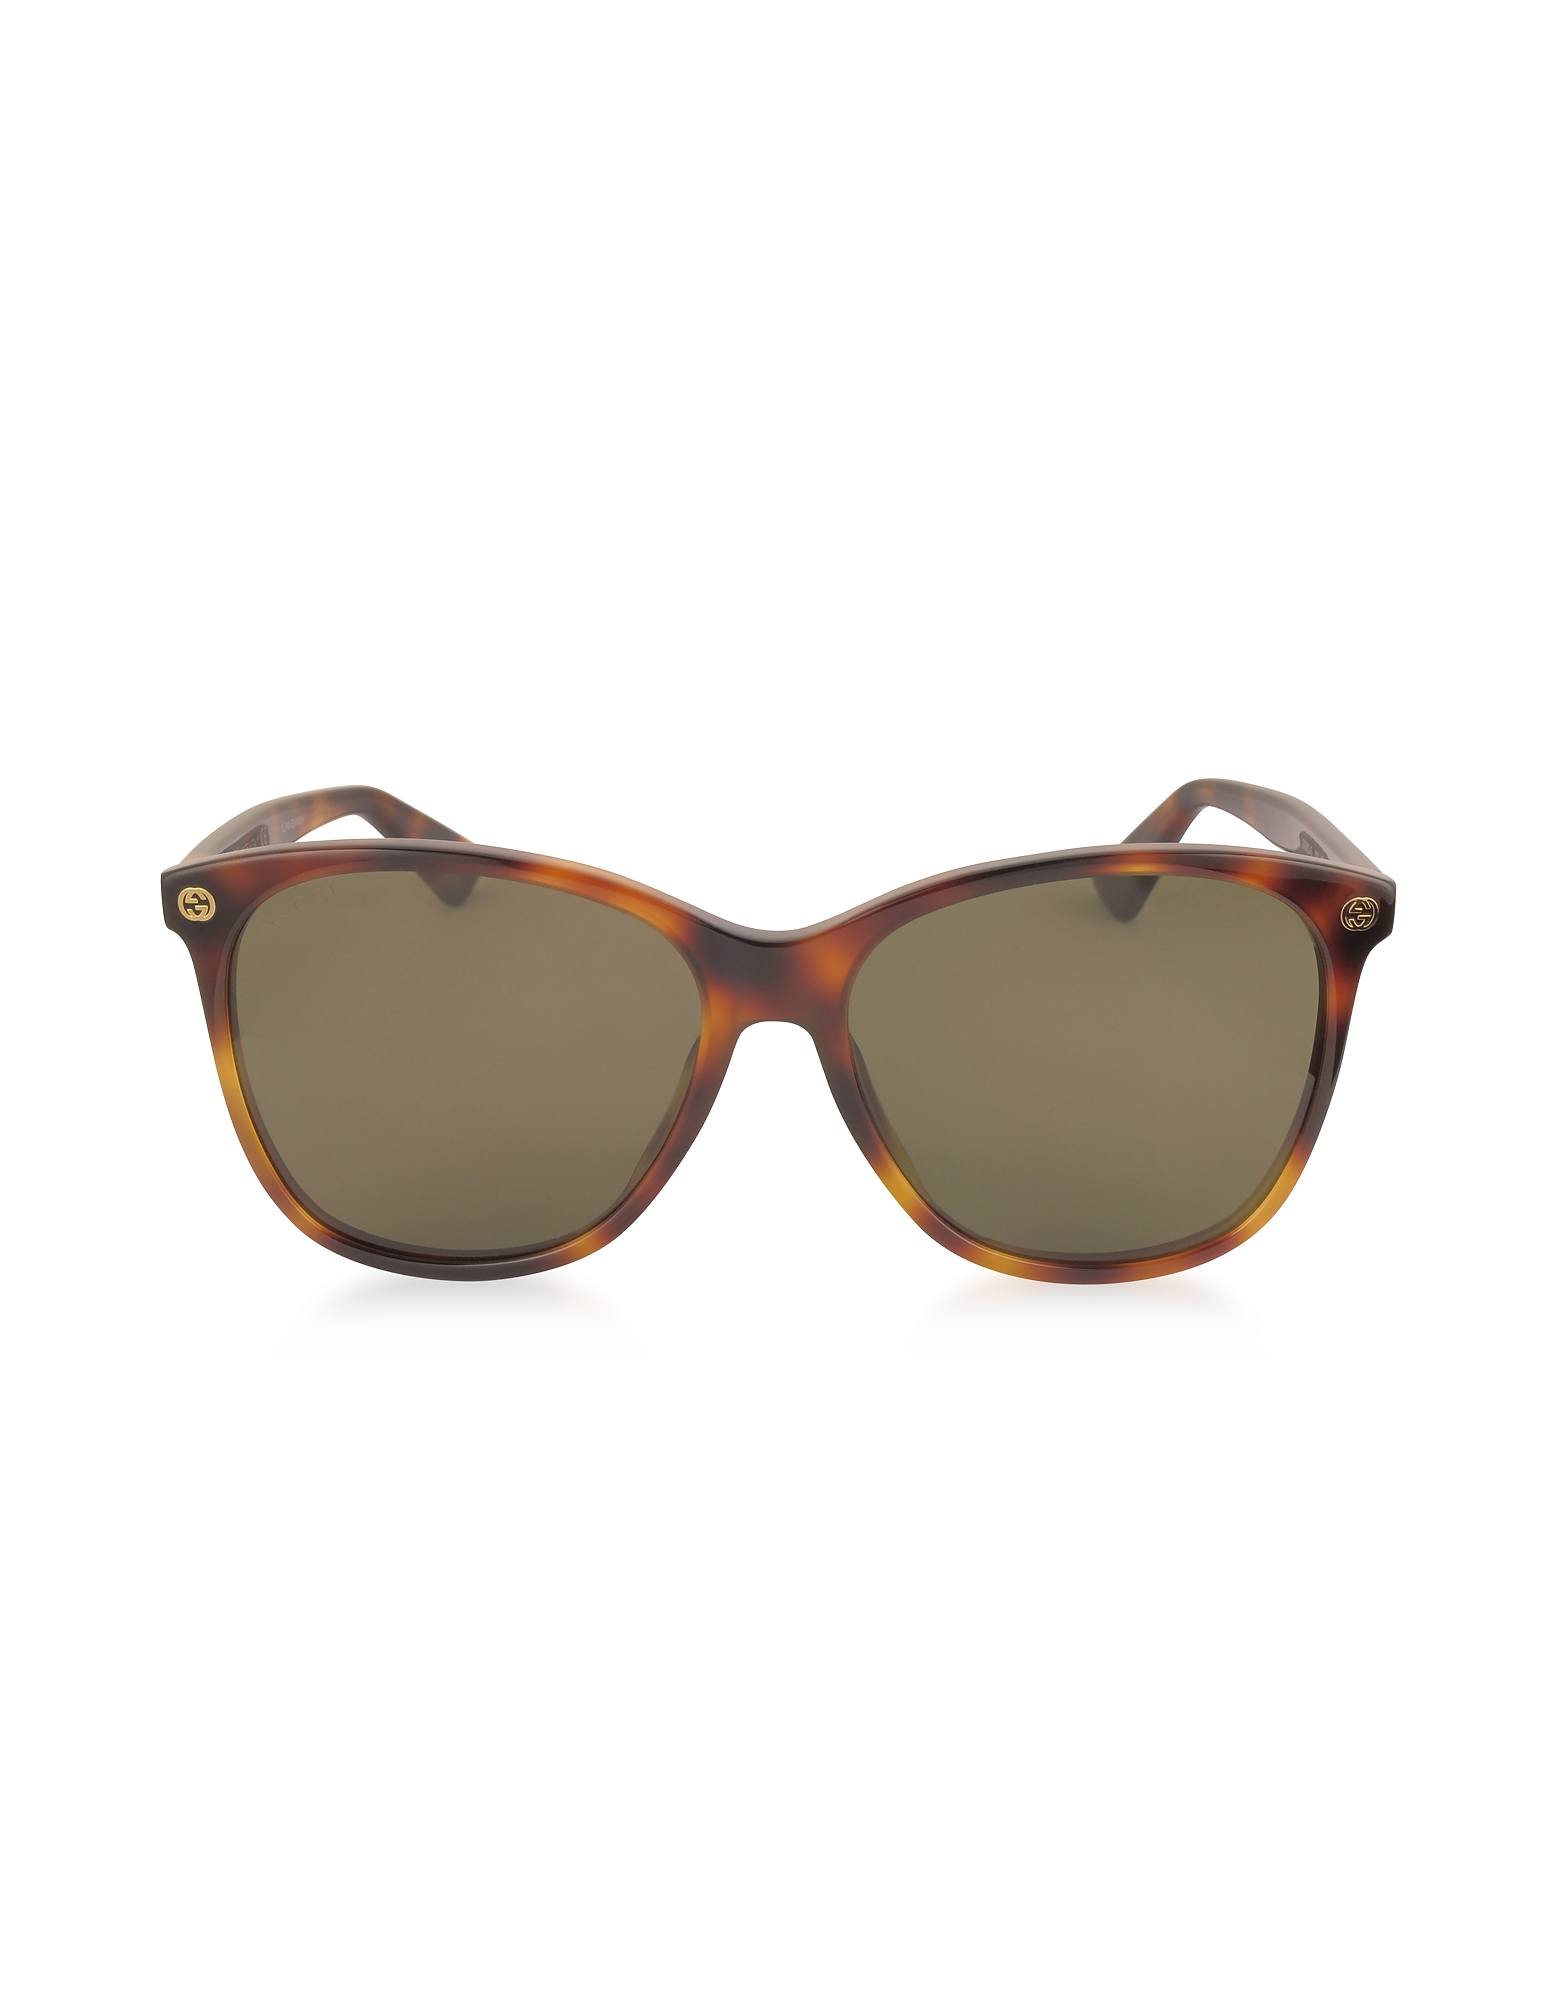 Gucci Designer Sunglasses, GG0024S Acetate Round Oversized Women's Sunglasses